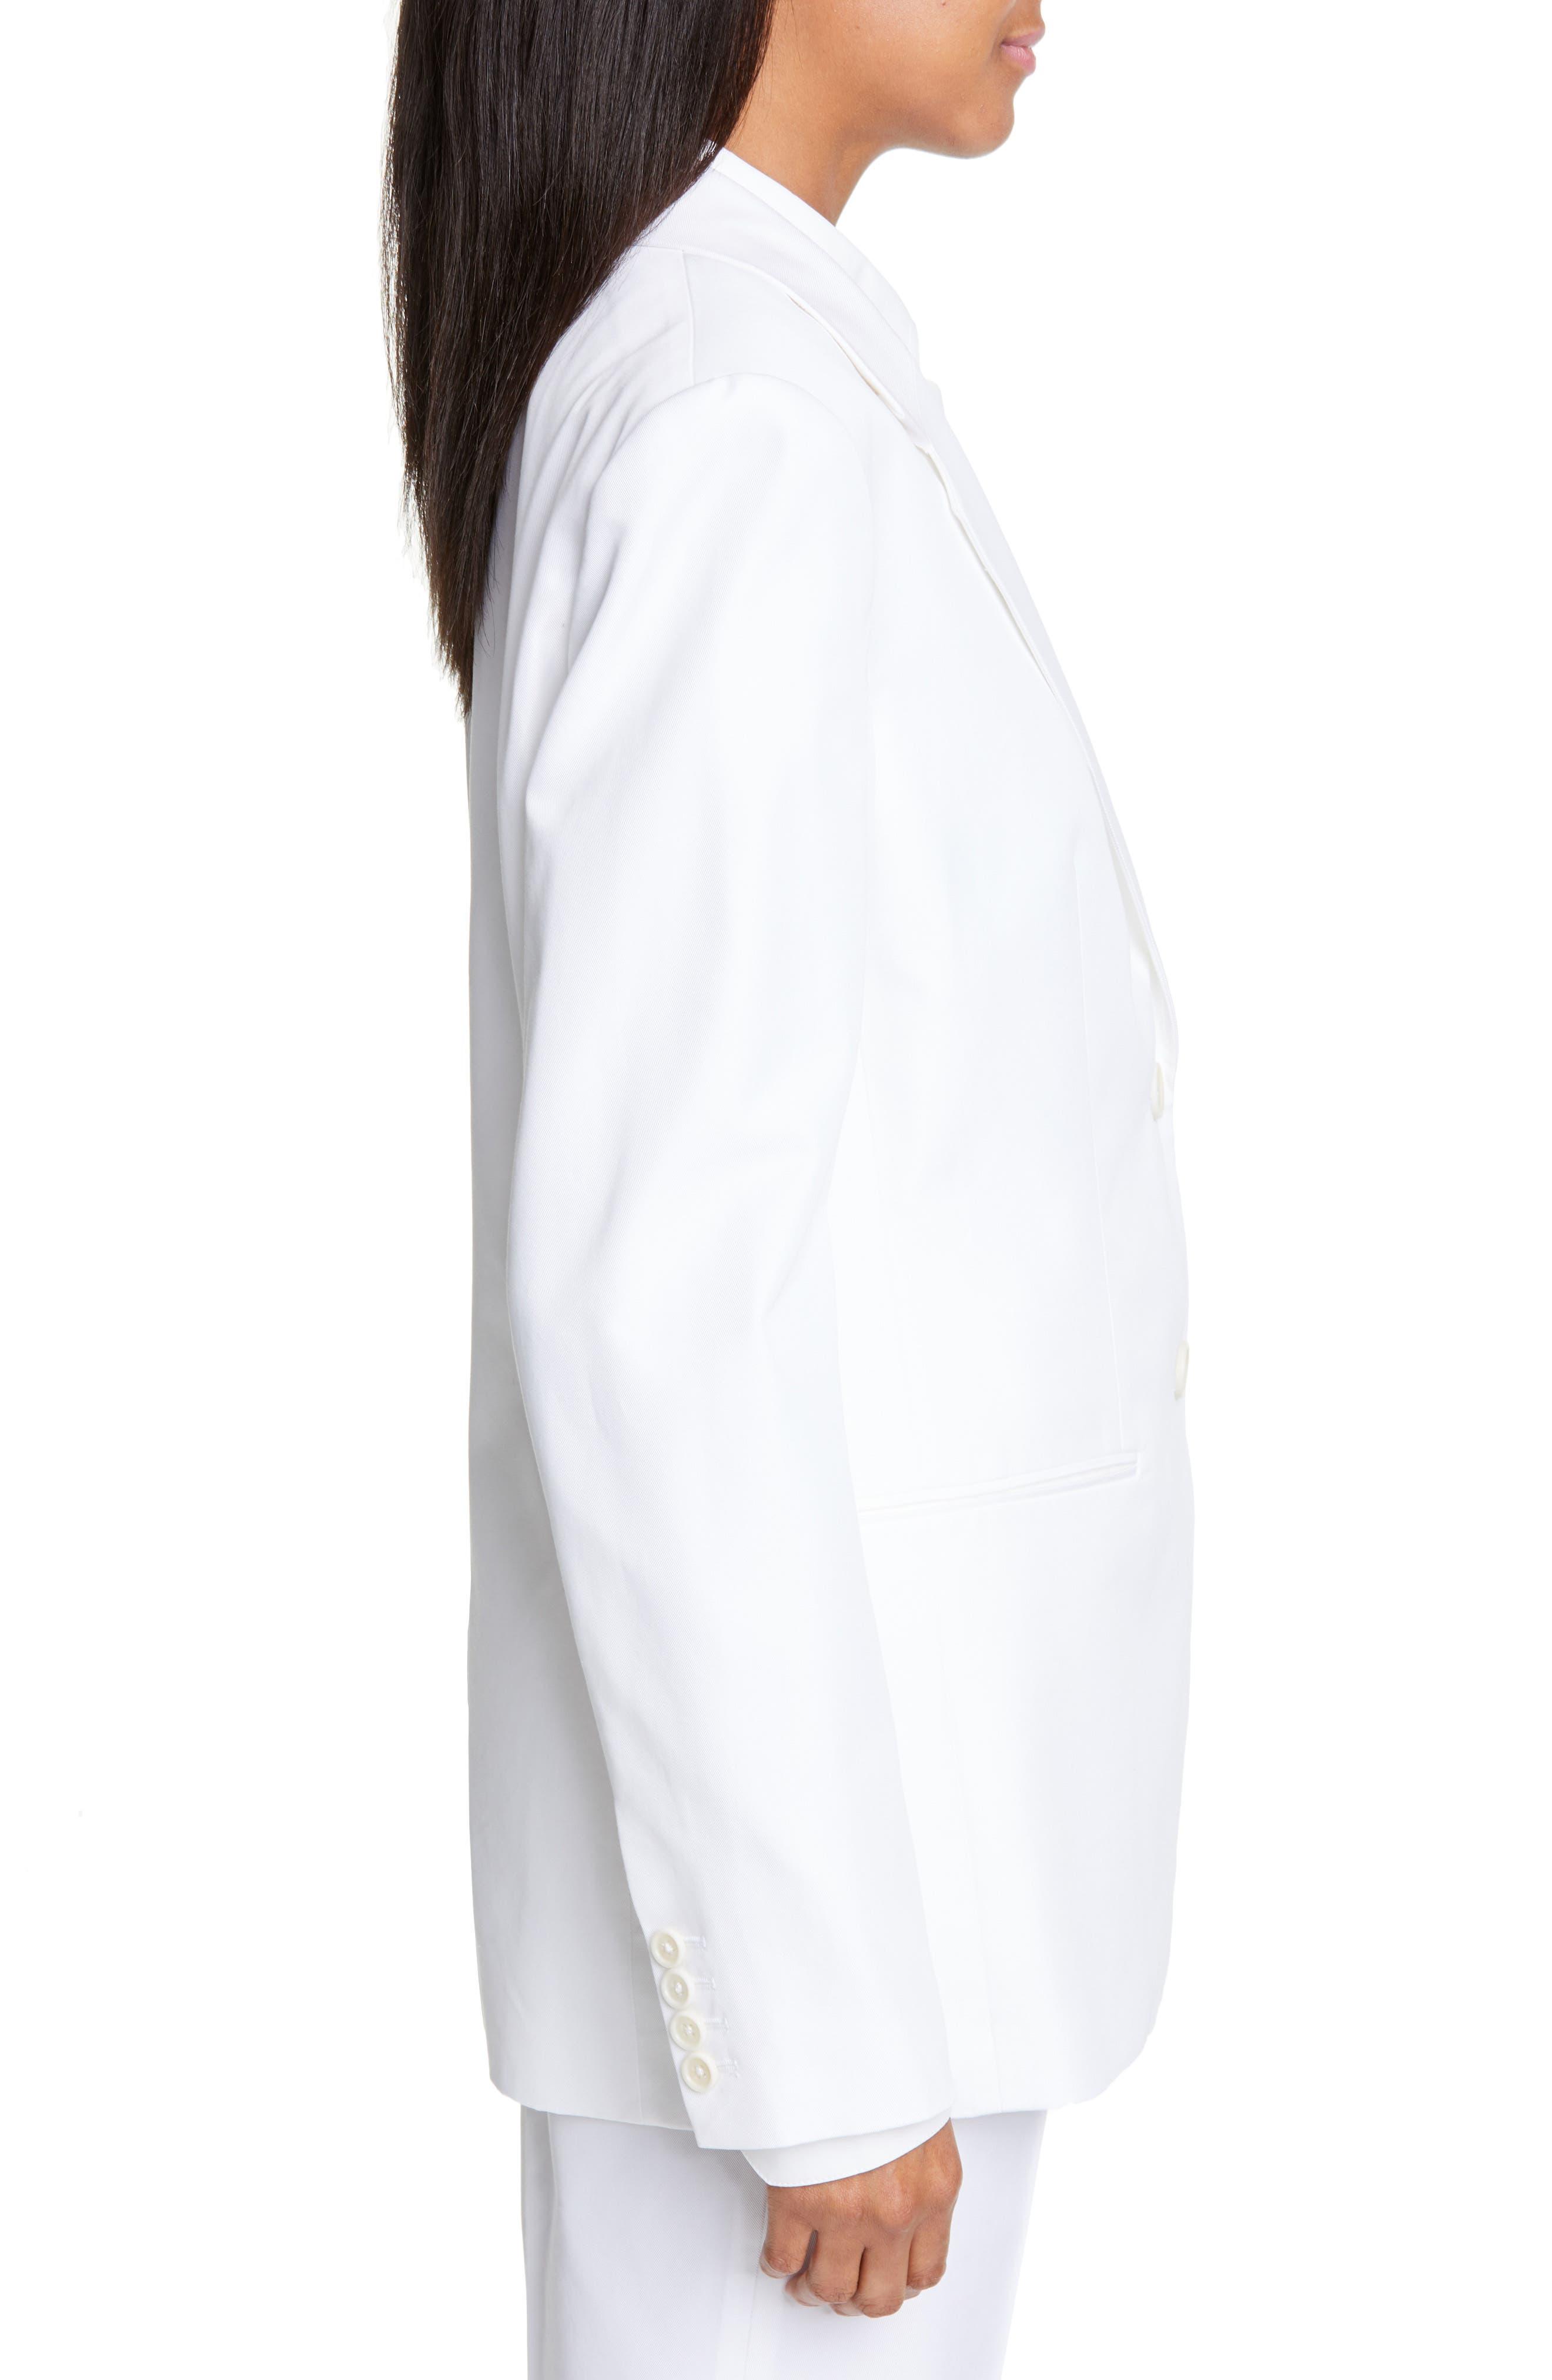 HELMUT LANG, Cotton Blend Blazer, Alternate thumbnail 4, color, WHITE